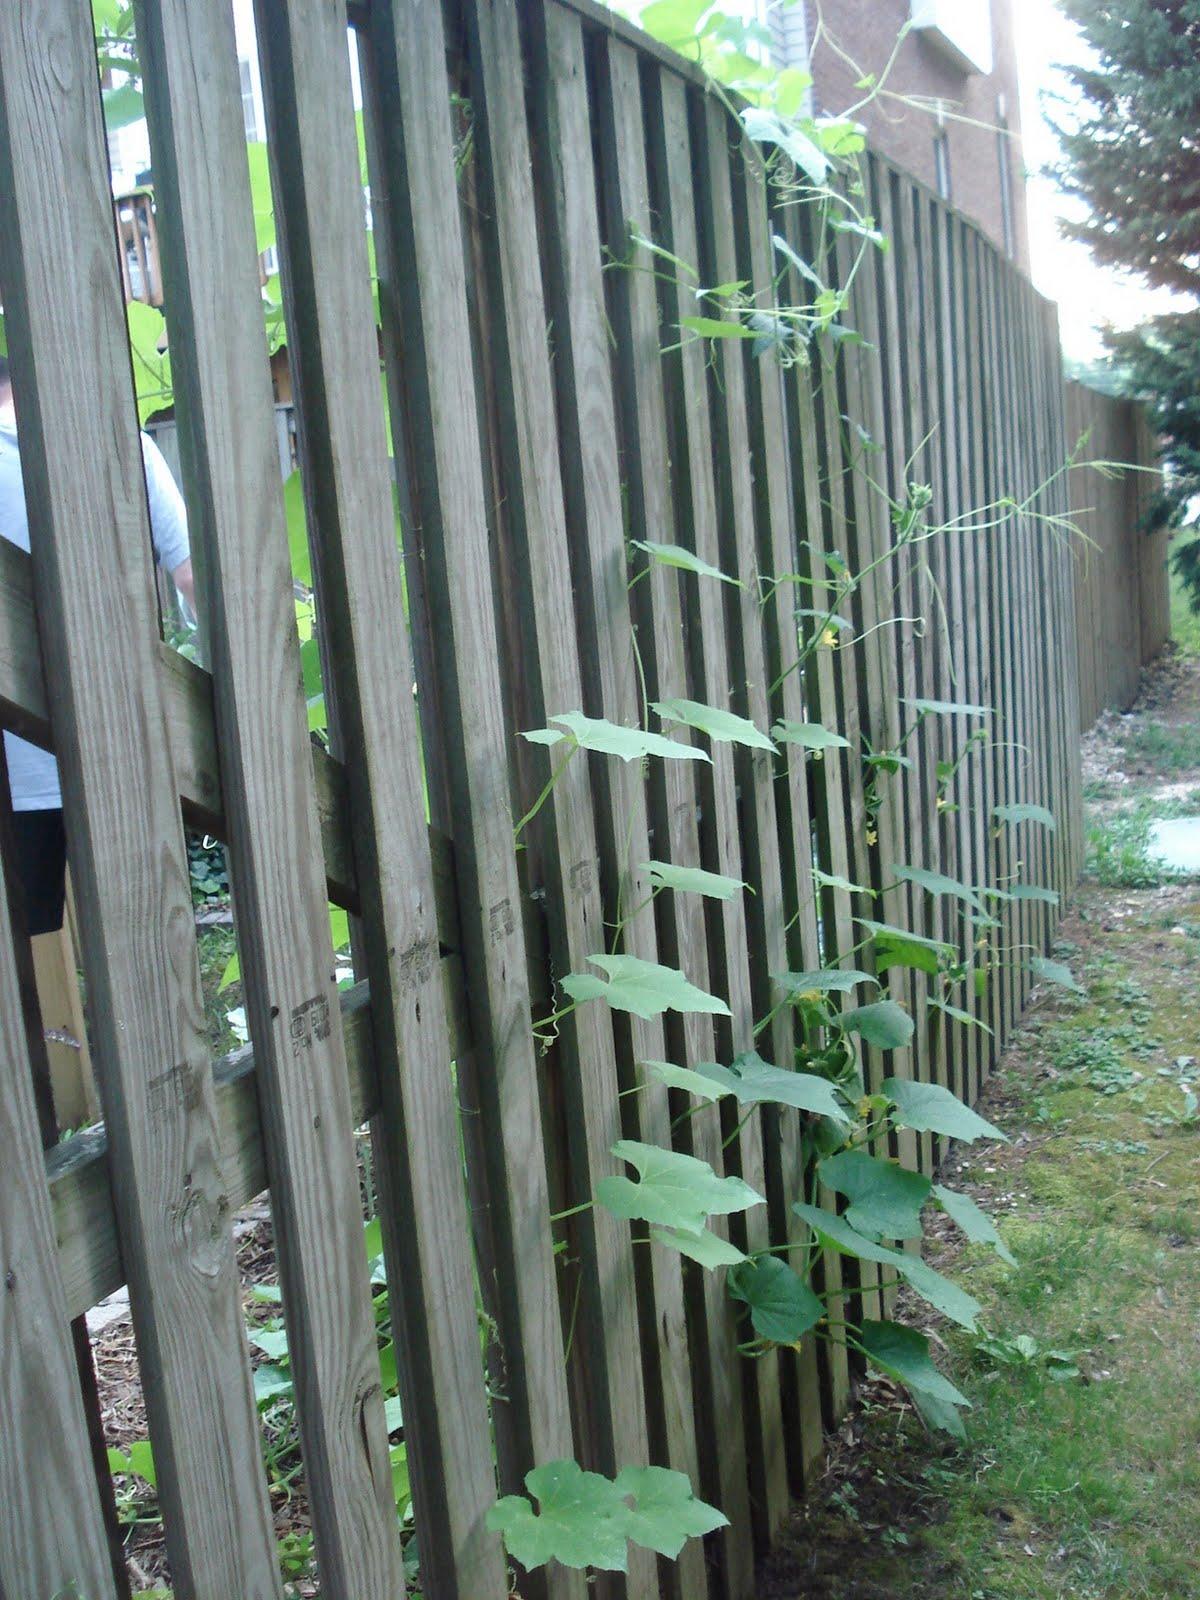 Bumble Lush Garden Almost Wordless Wednesday